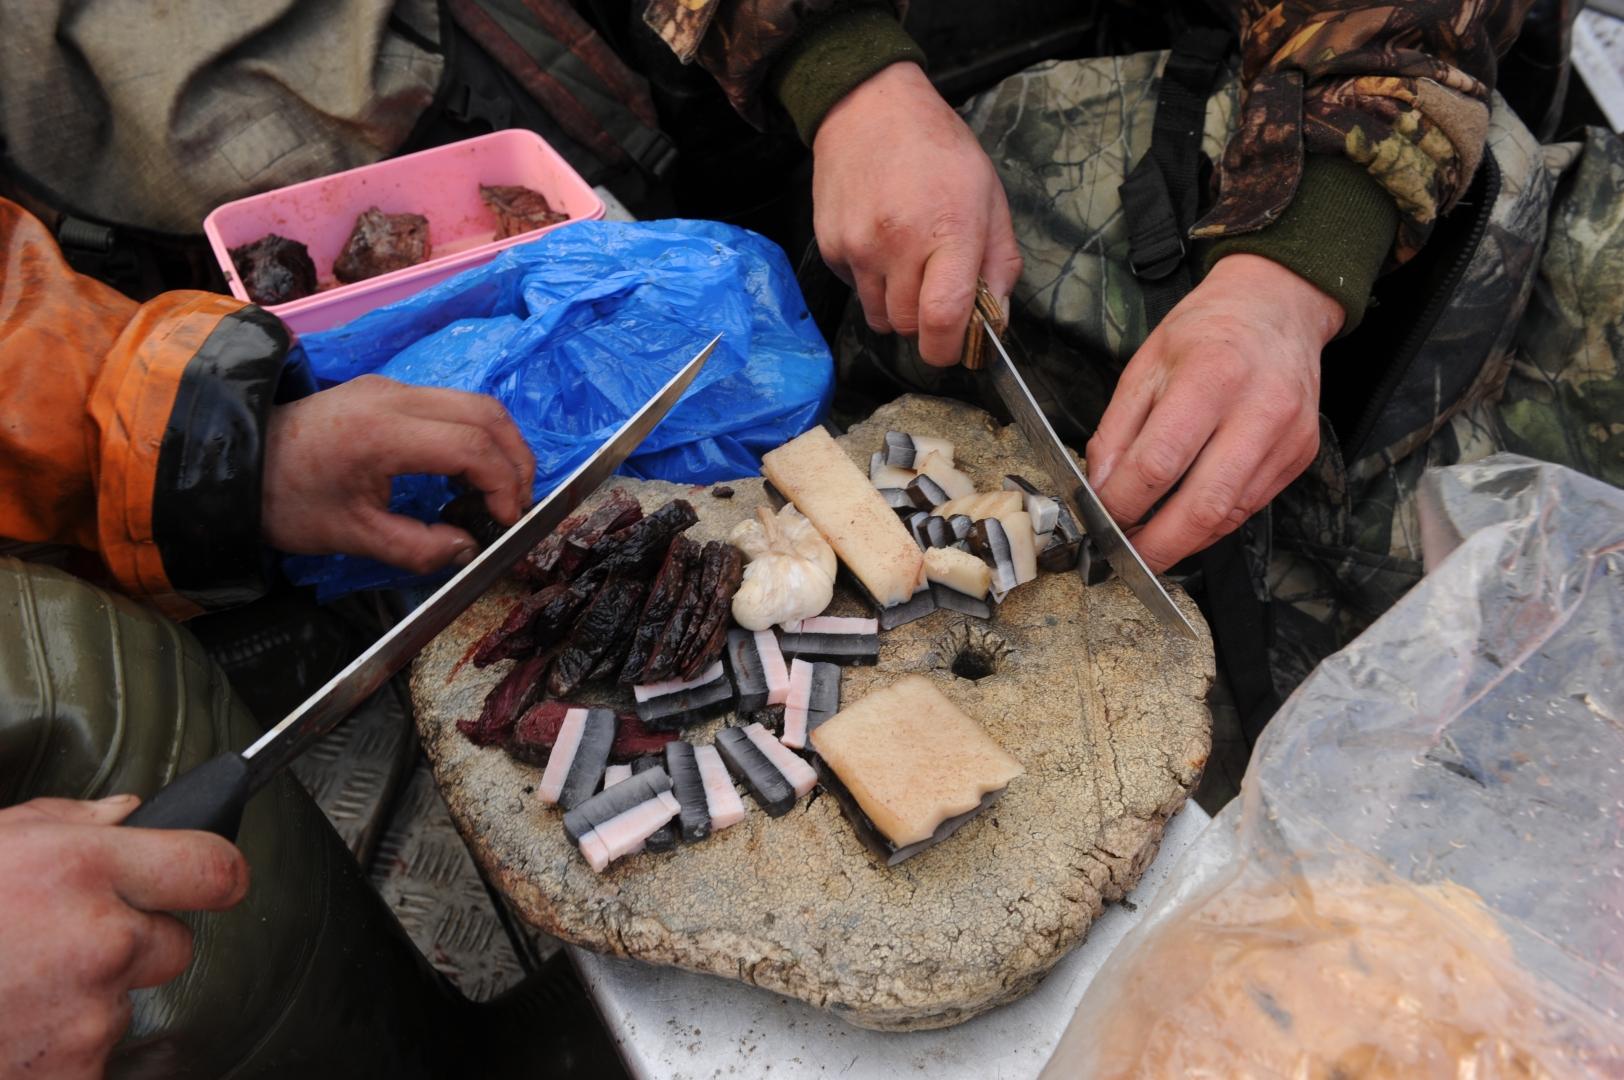 Чукчи едят кожу кита – свежую и вареную, нарезав ее мелкими ломтиками